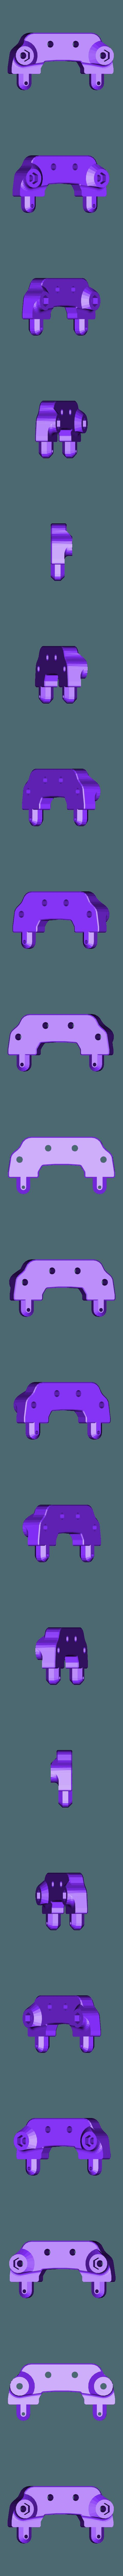 Front shocks mount__.STL Download free STL file 1/10 RC 4WD TRUGGY BT250.2 • 3D printer object, ivnssnn